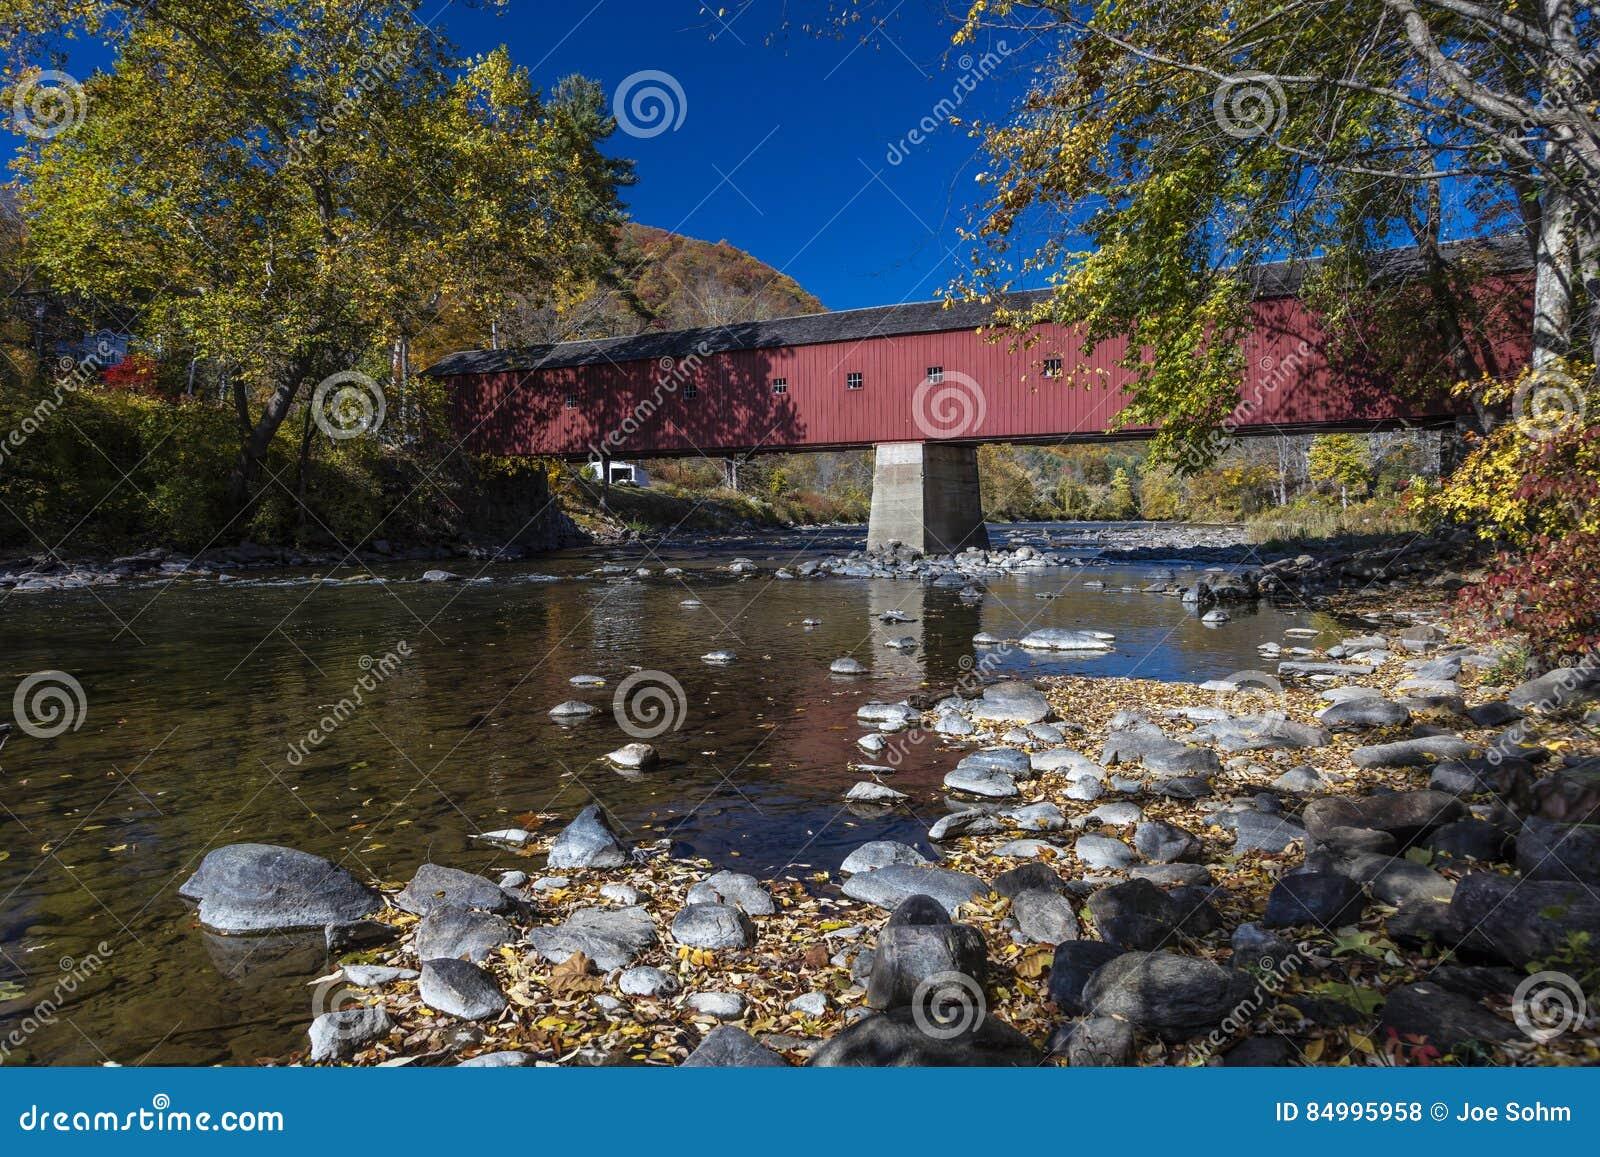 Bedeckte rote Brücke, West- Cornwall-überdachte Brücke über Housatonic-Fluss, West-Cornwall, Connecticut, USA - 18. Oktober 2016